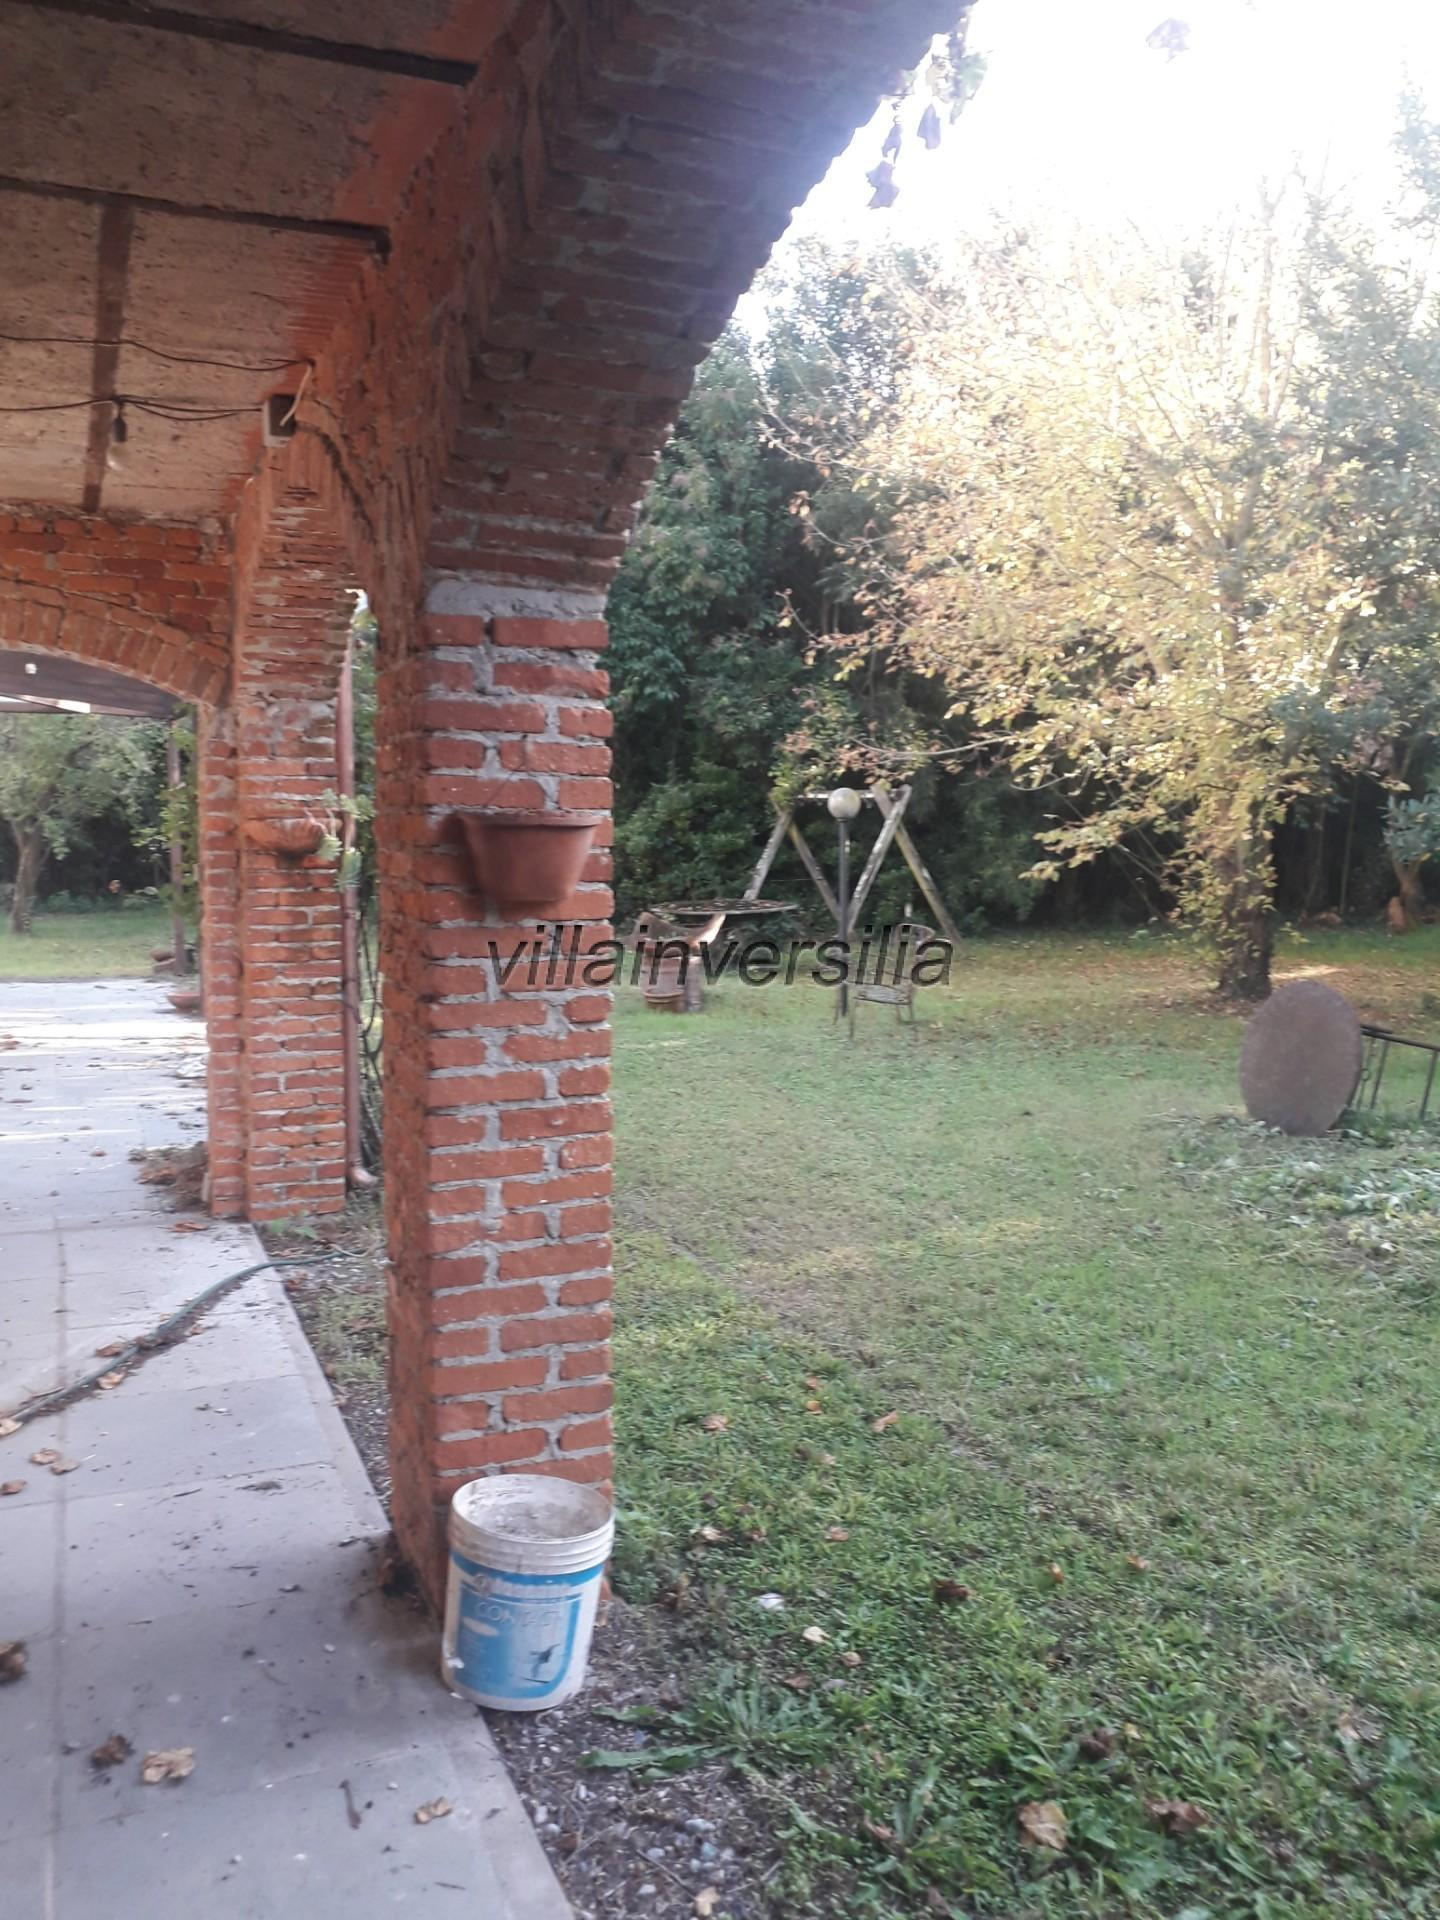 Photo 19/37 for ref. V 4217 casale Toscano